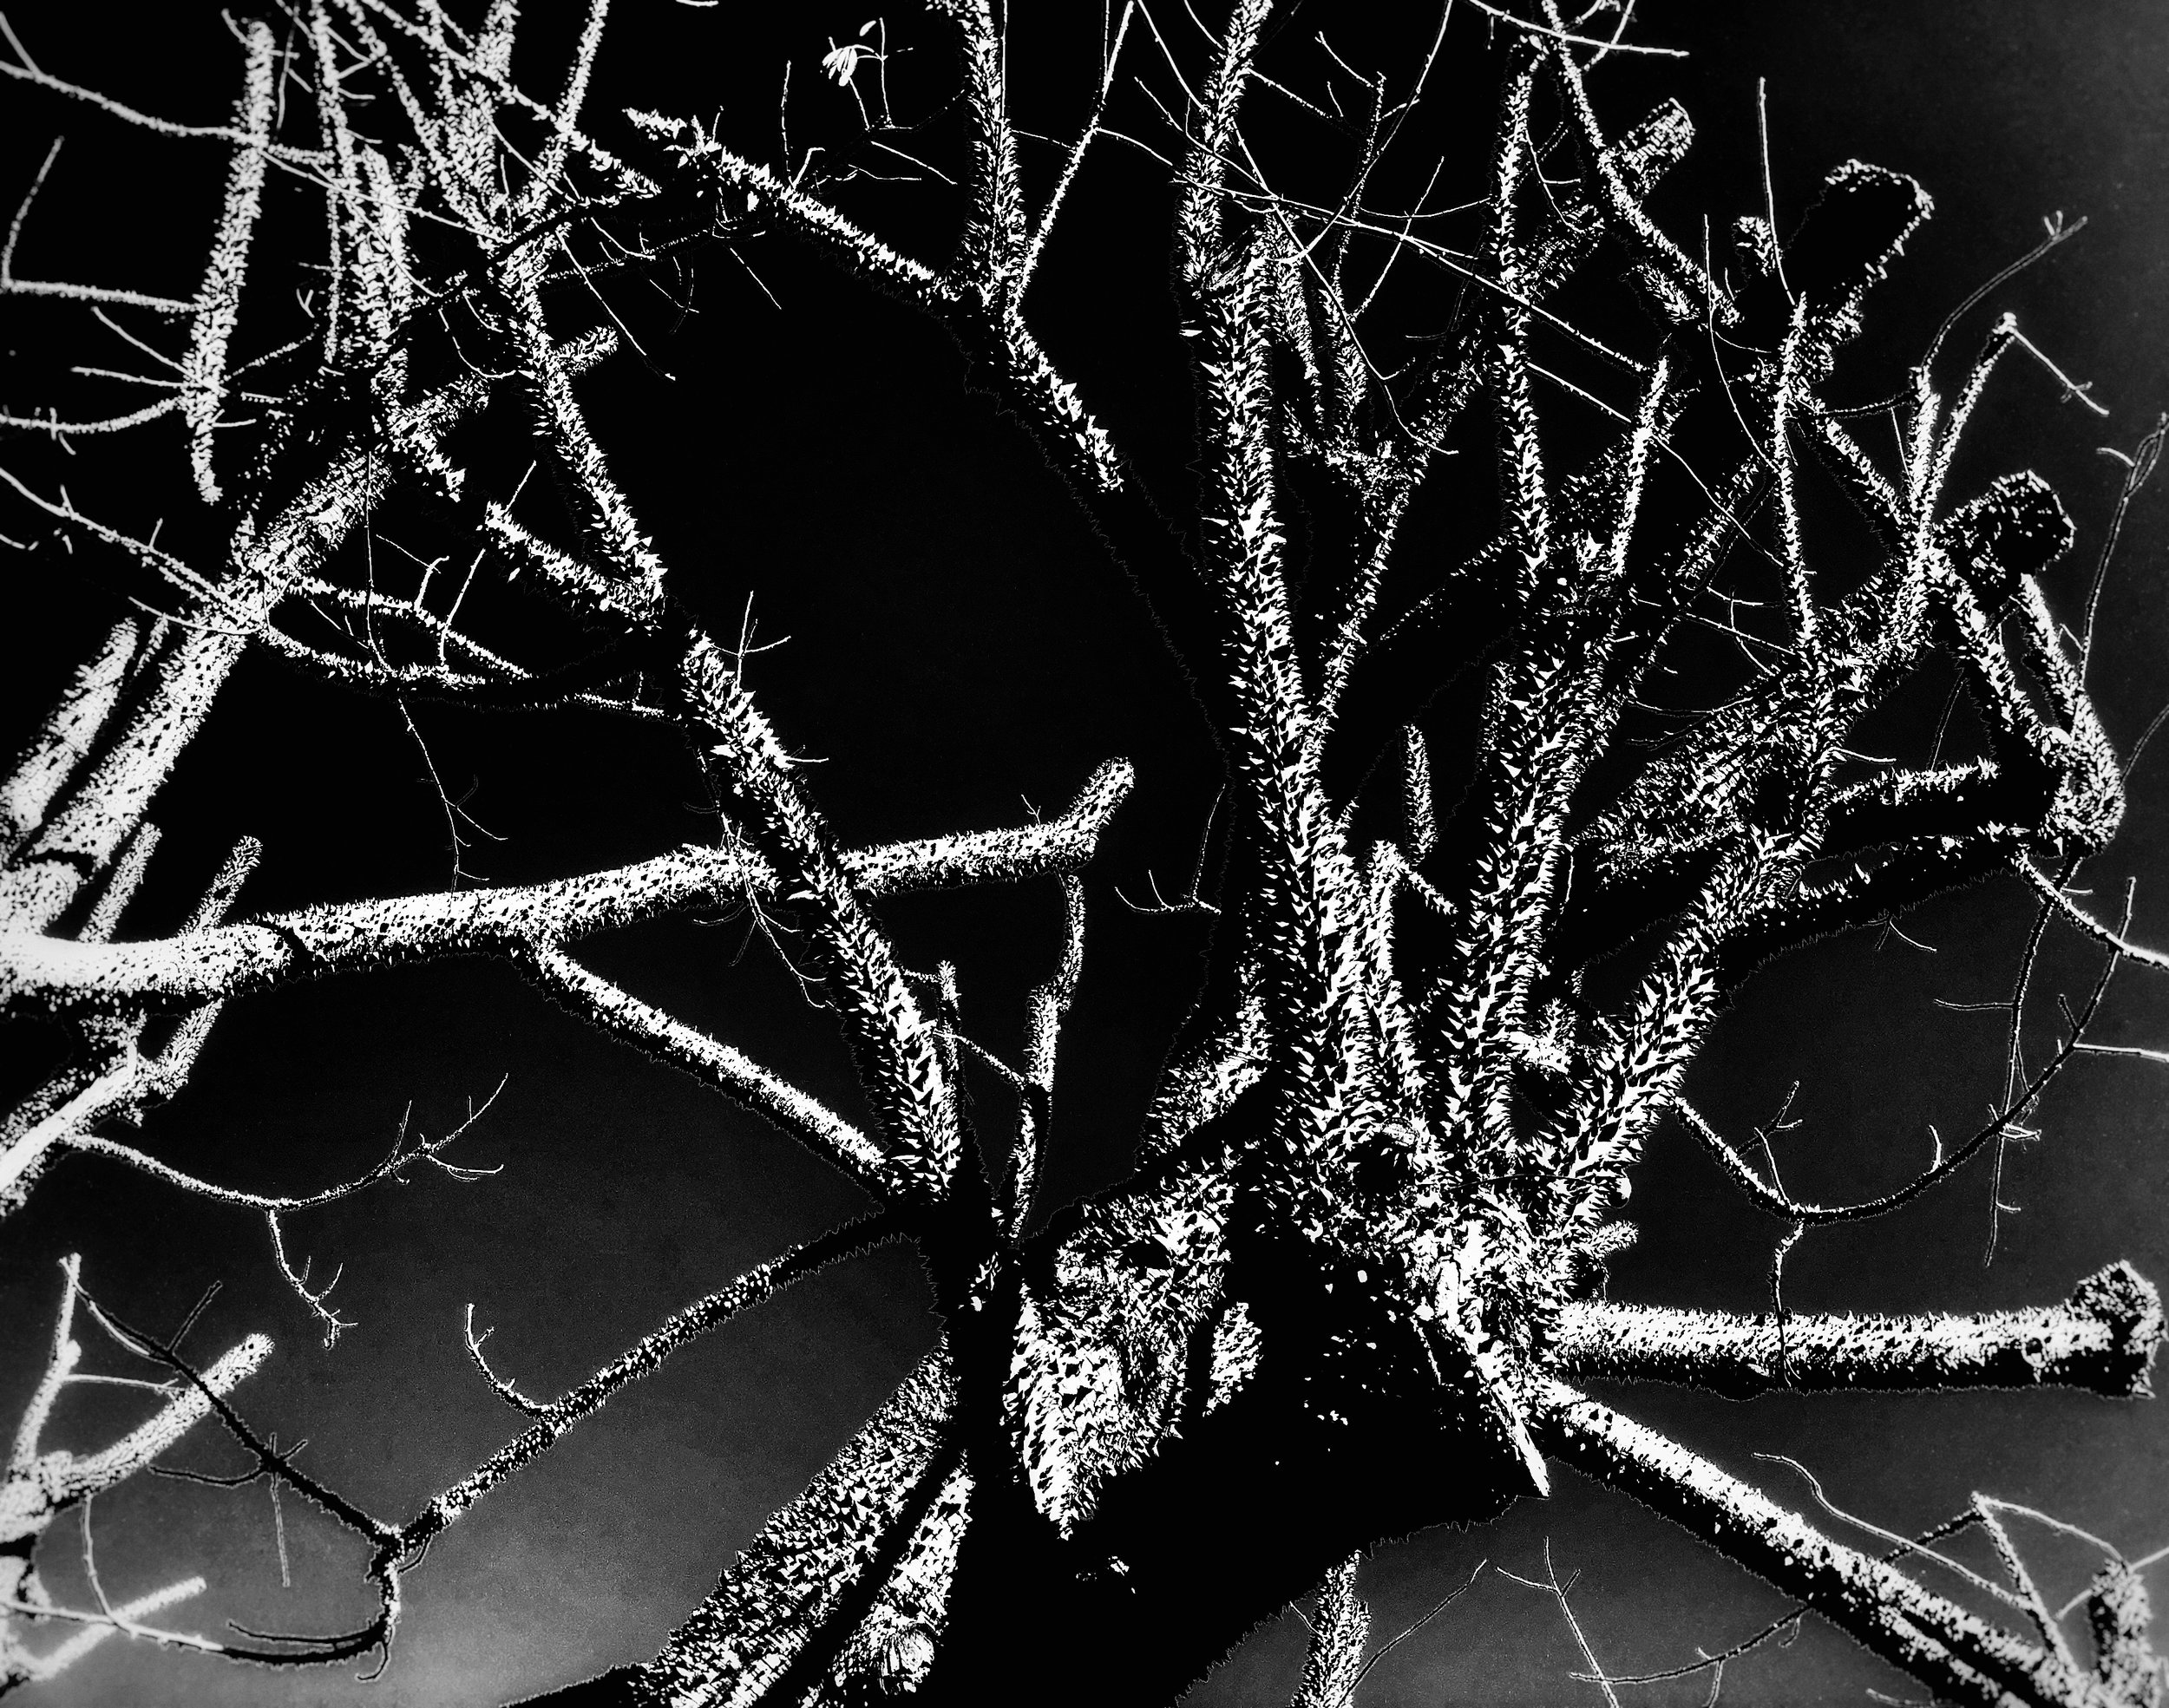 Noir Branches.jpg